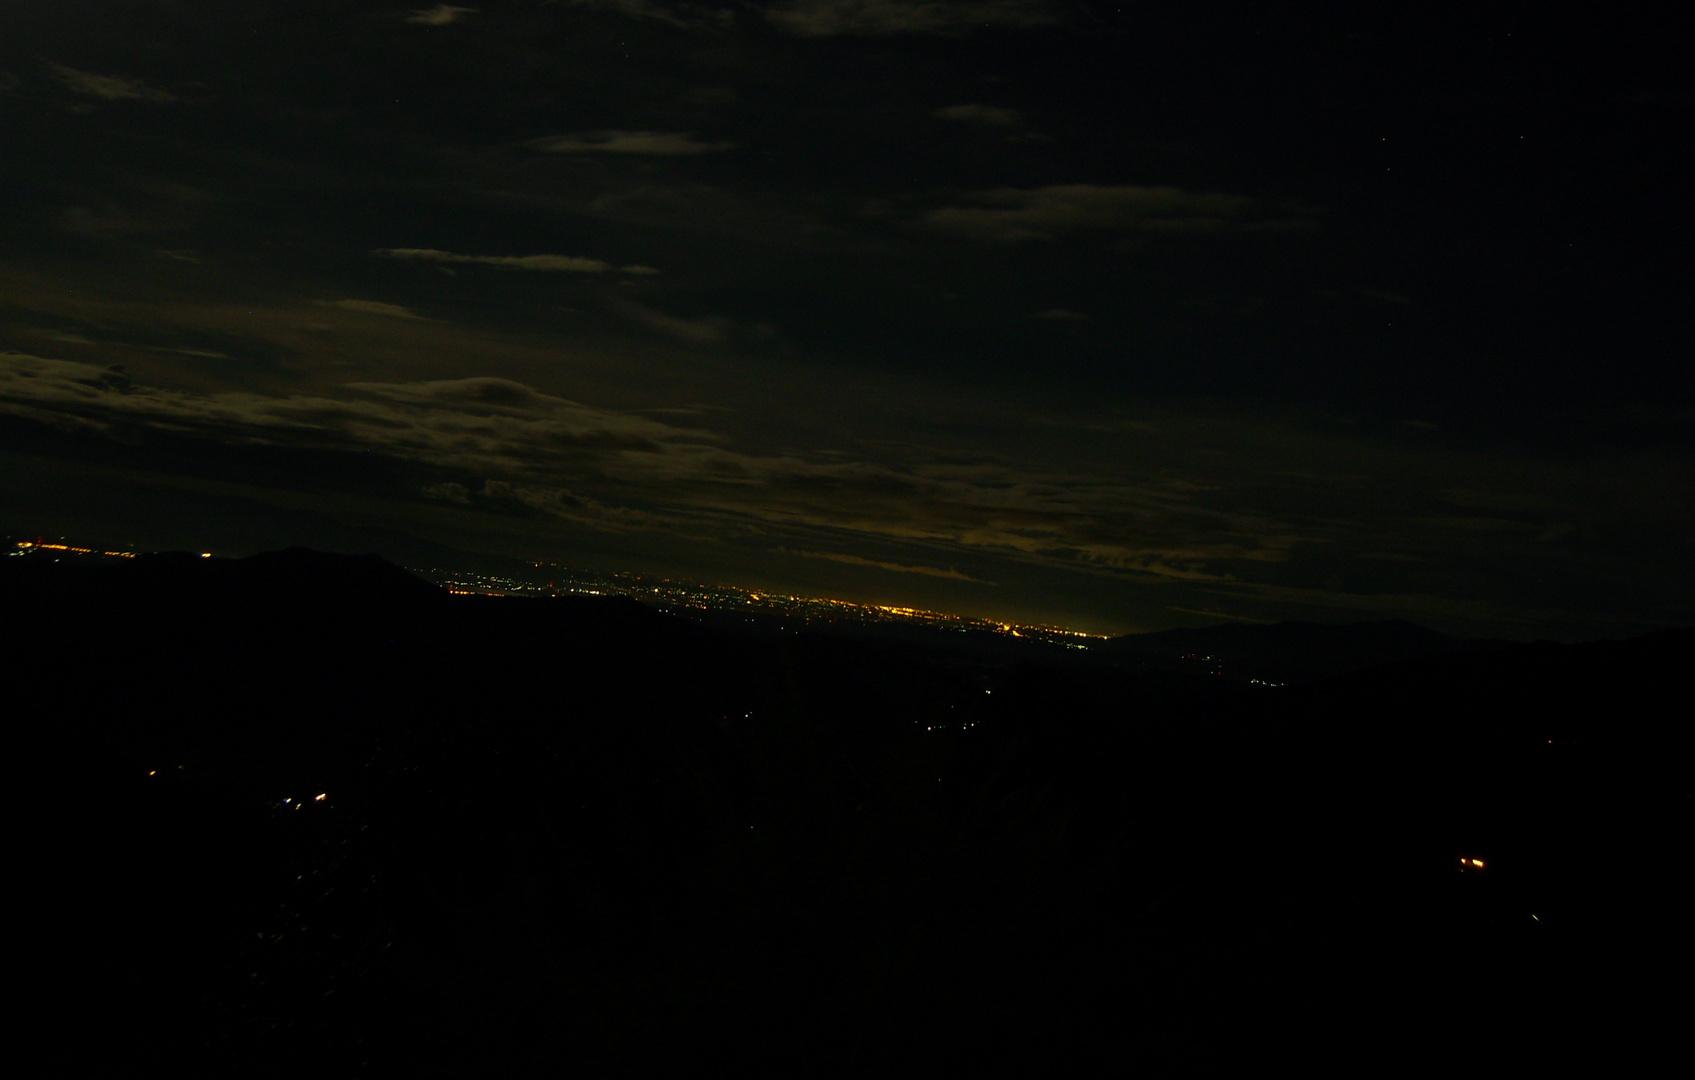 Dark Night - Chiang Mai